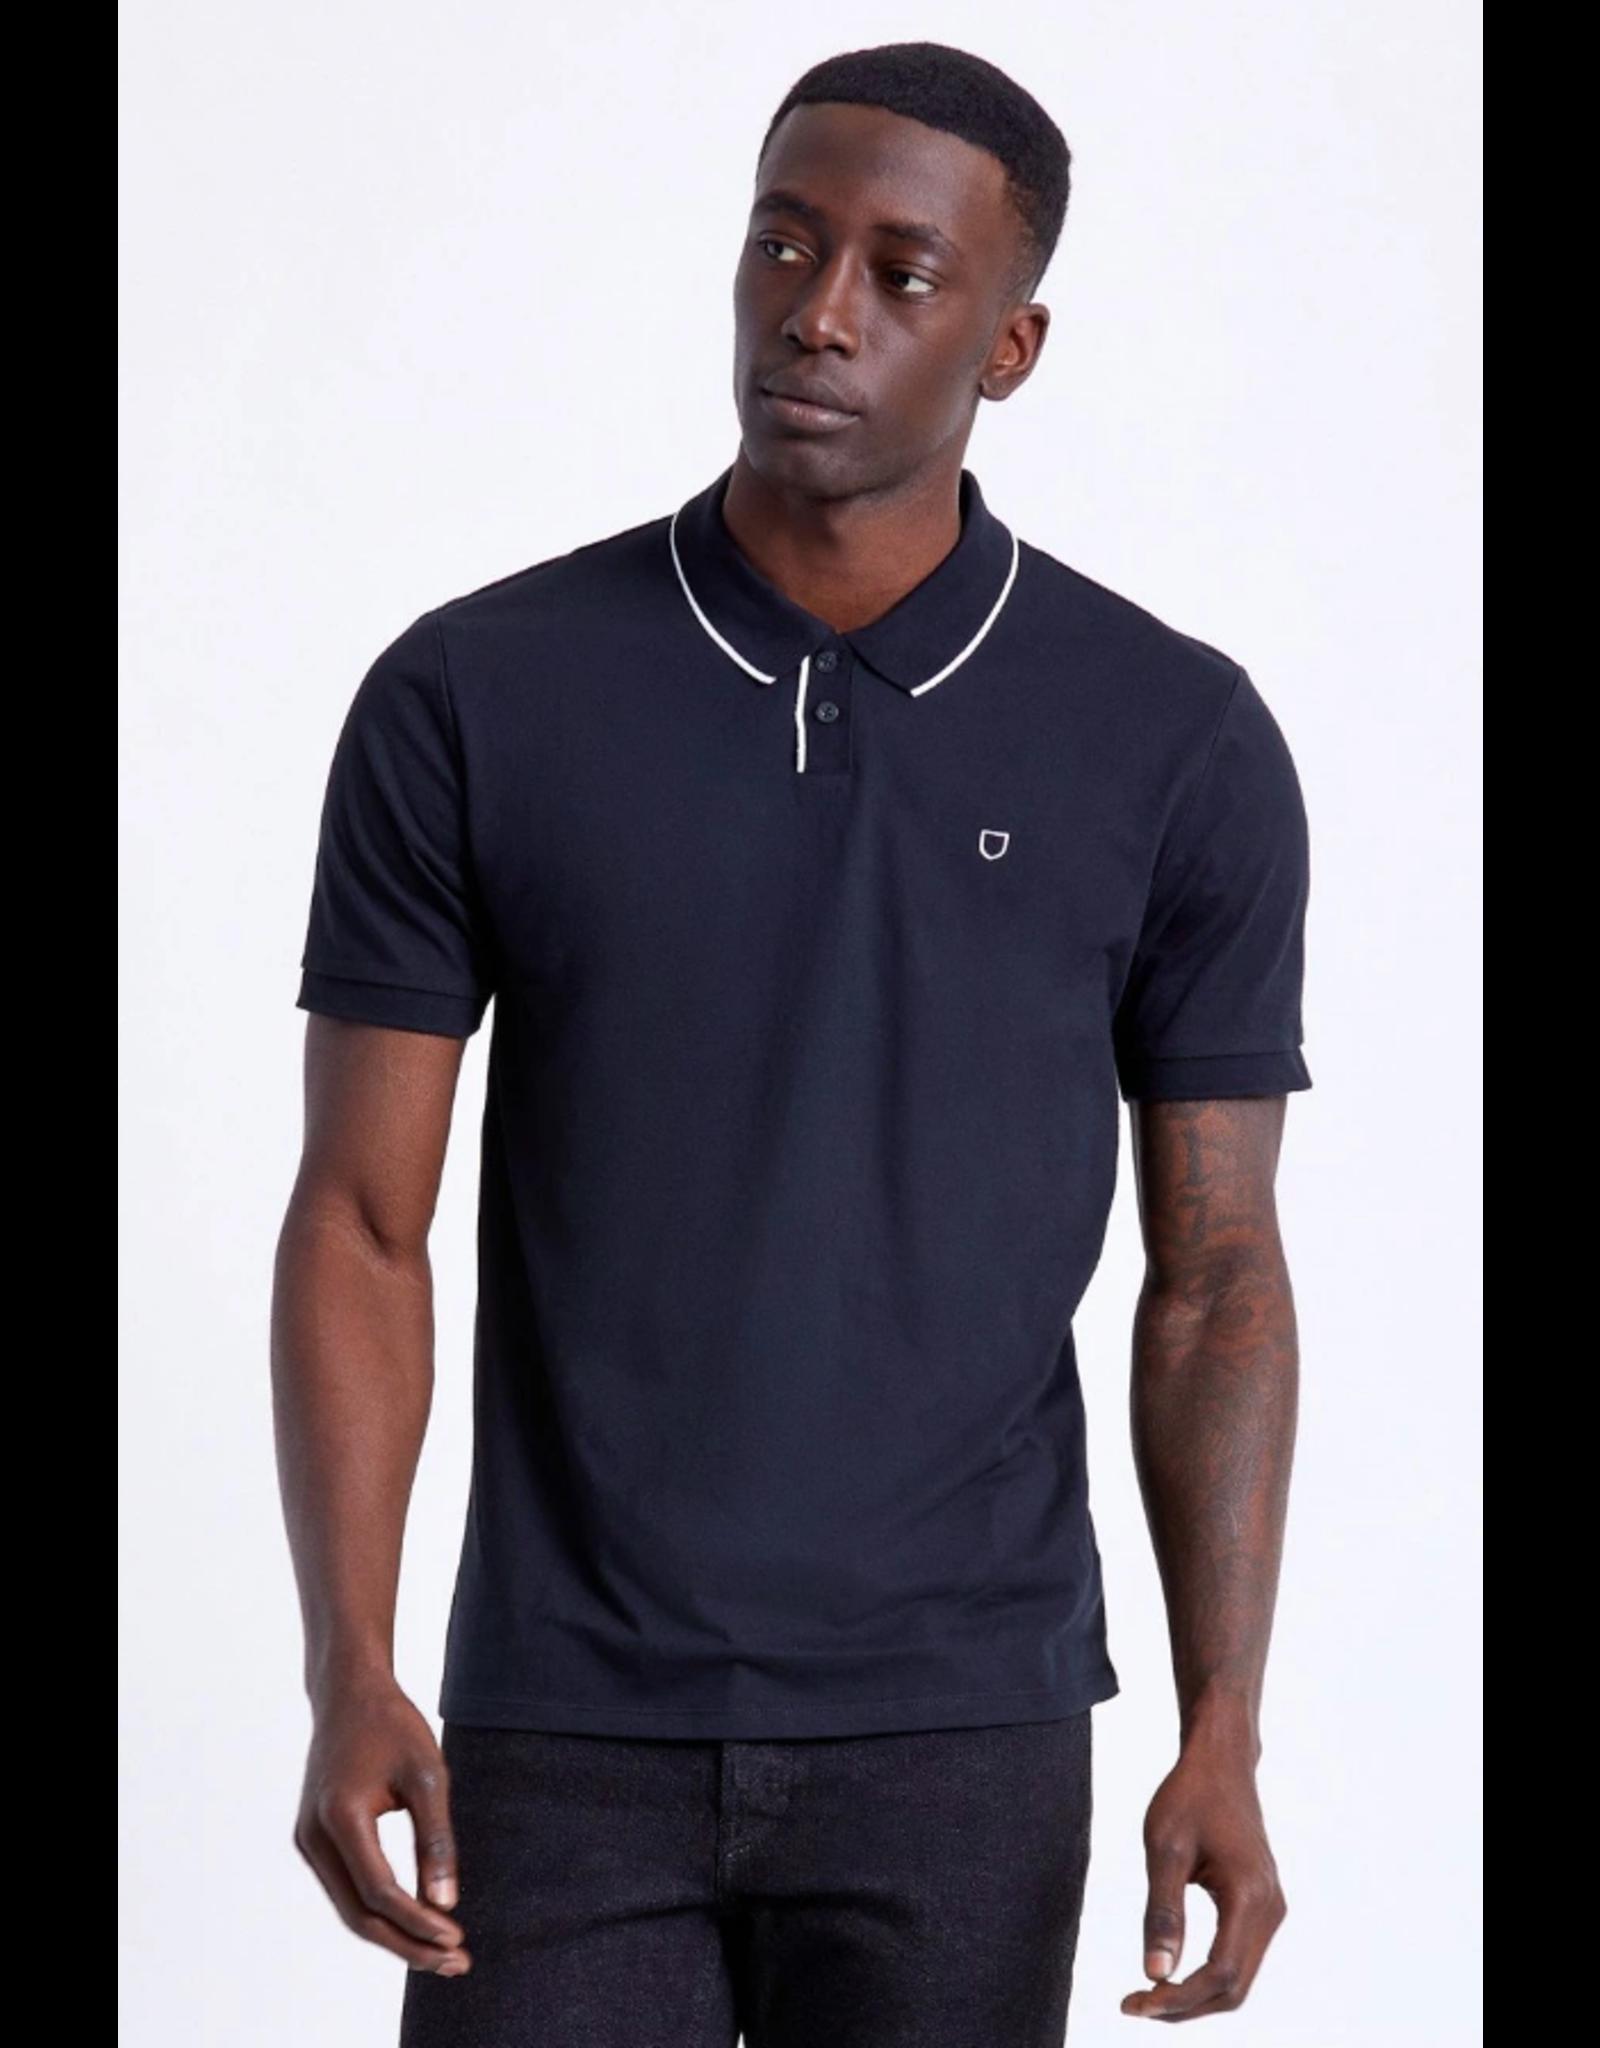 Brixton Proper S/S Jersey Polo Knit - Black